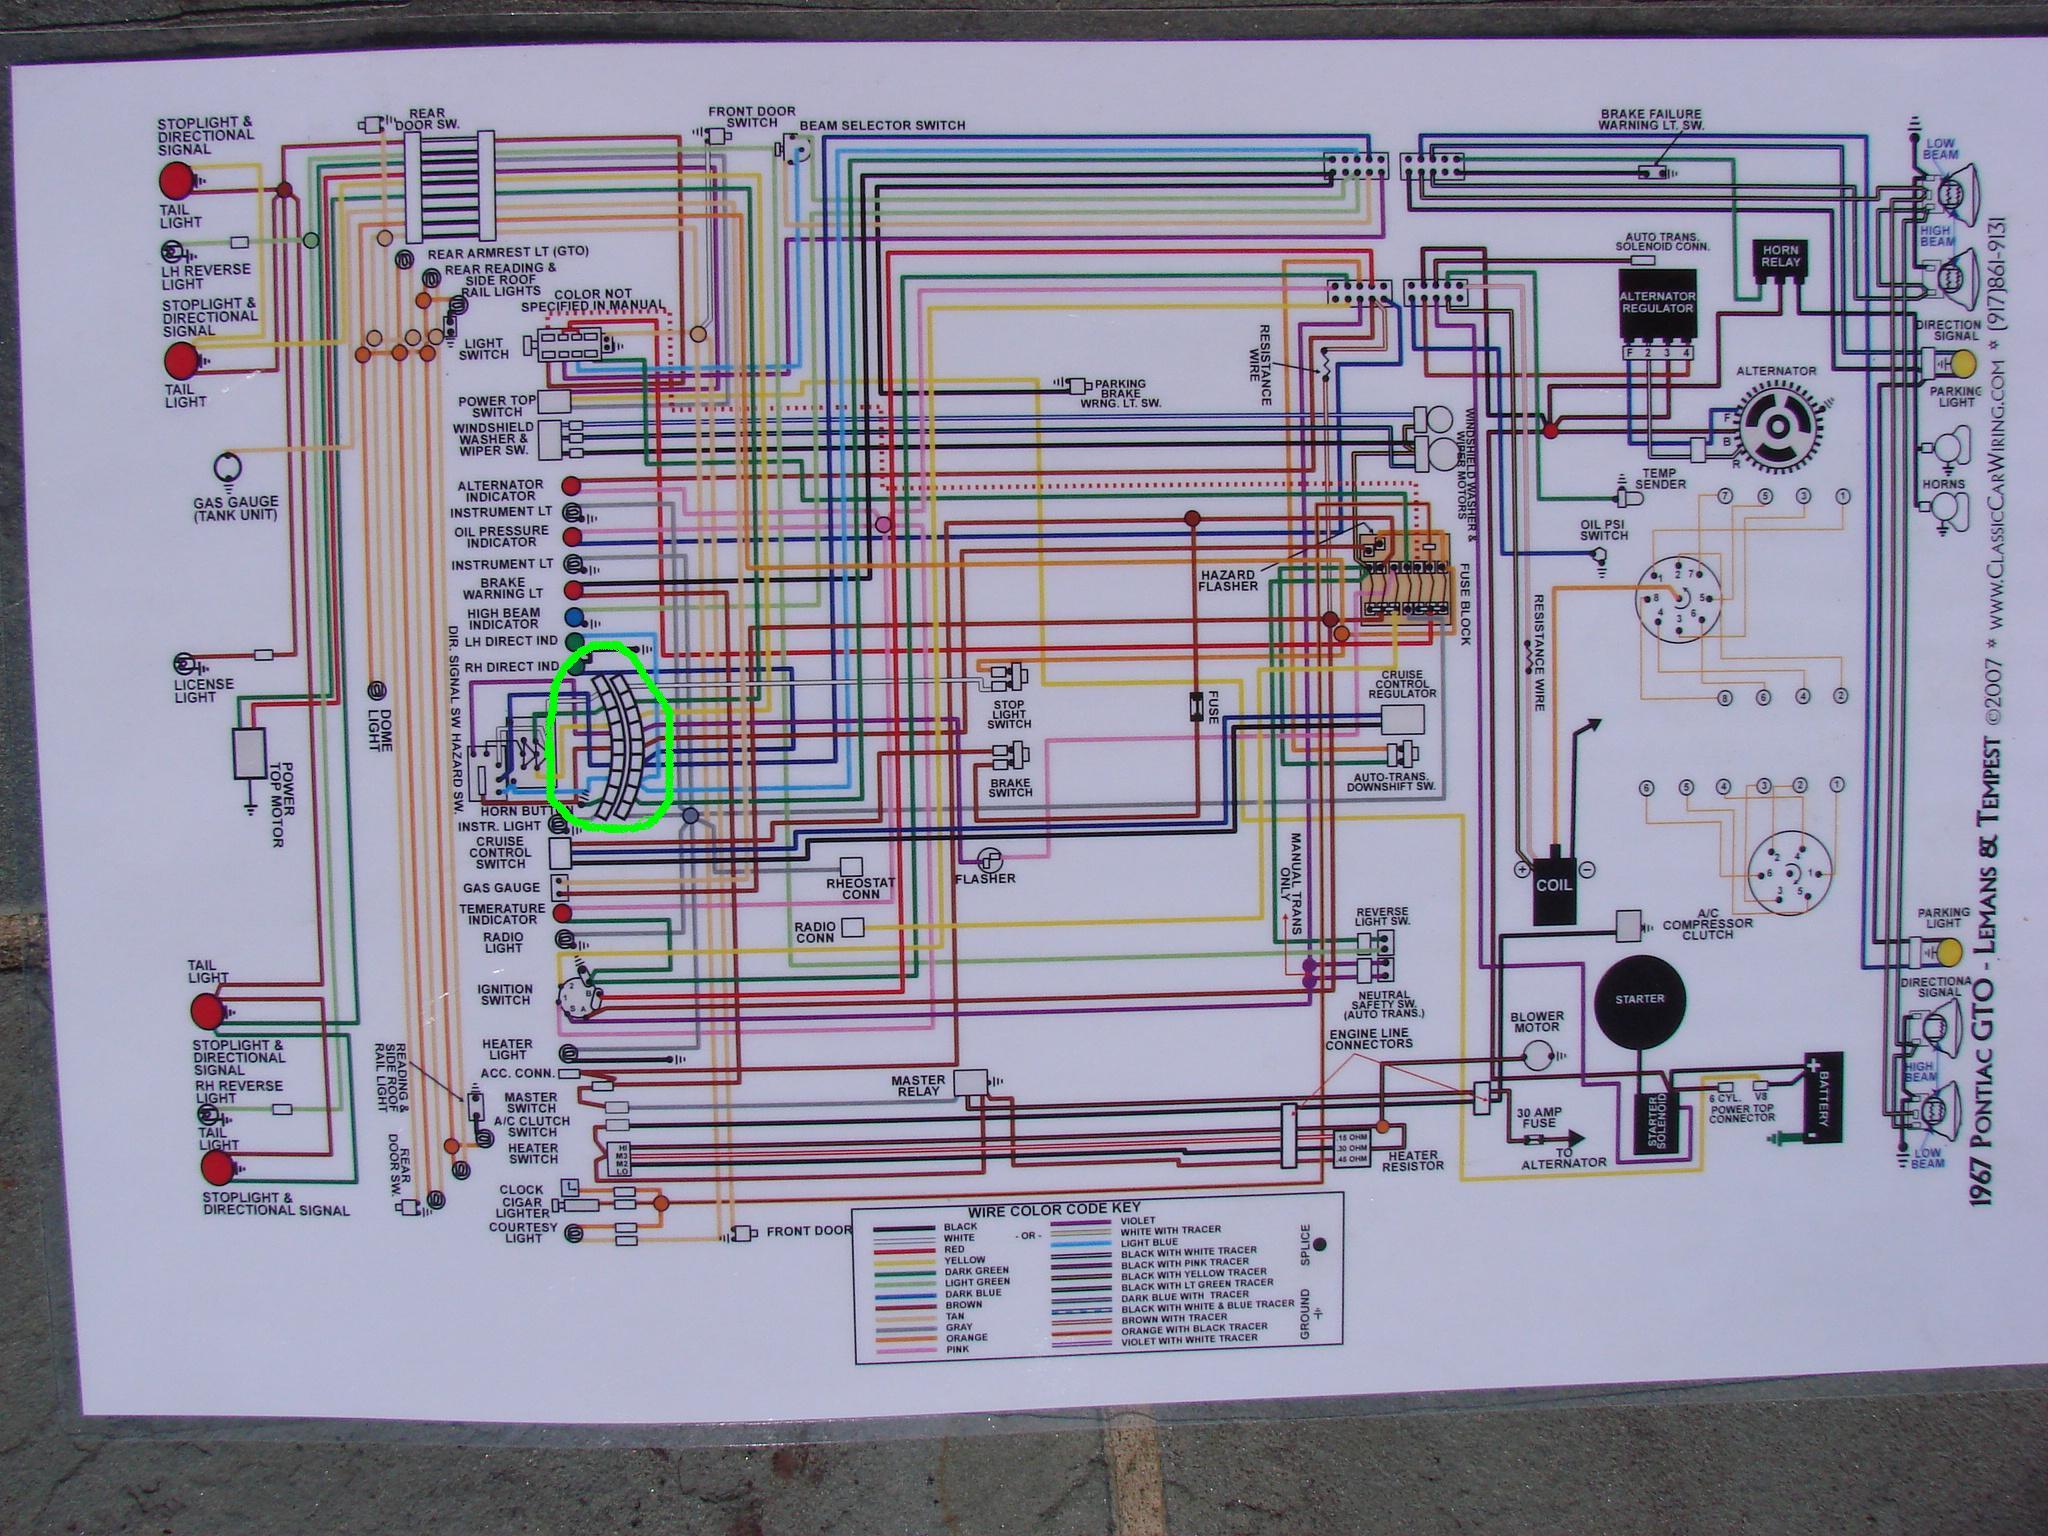 1964 chevy truck c10 wiring diagram 1964 image 64 chevy c10 wiring diagram 65 truck 64 auto wiring diagram on 1964 chevy truck c10